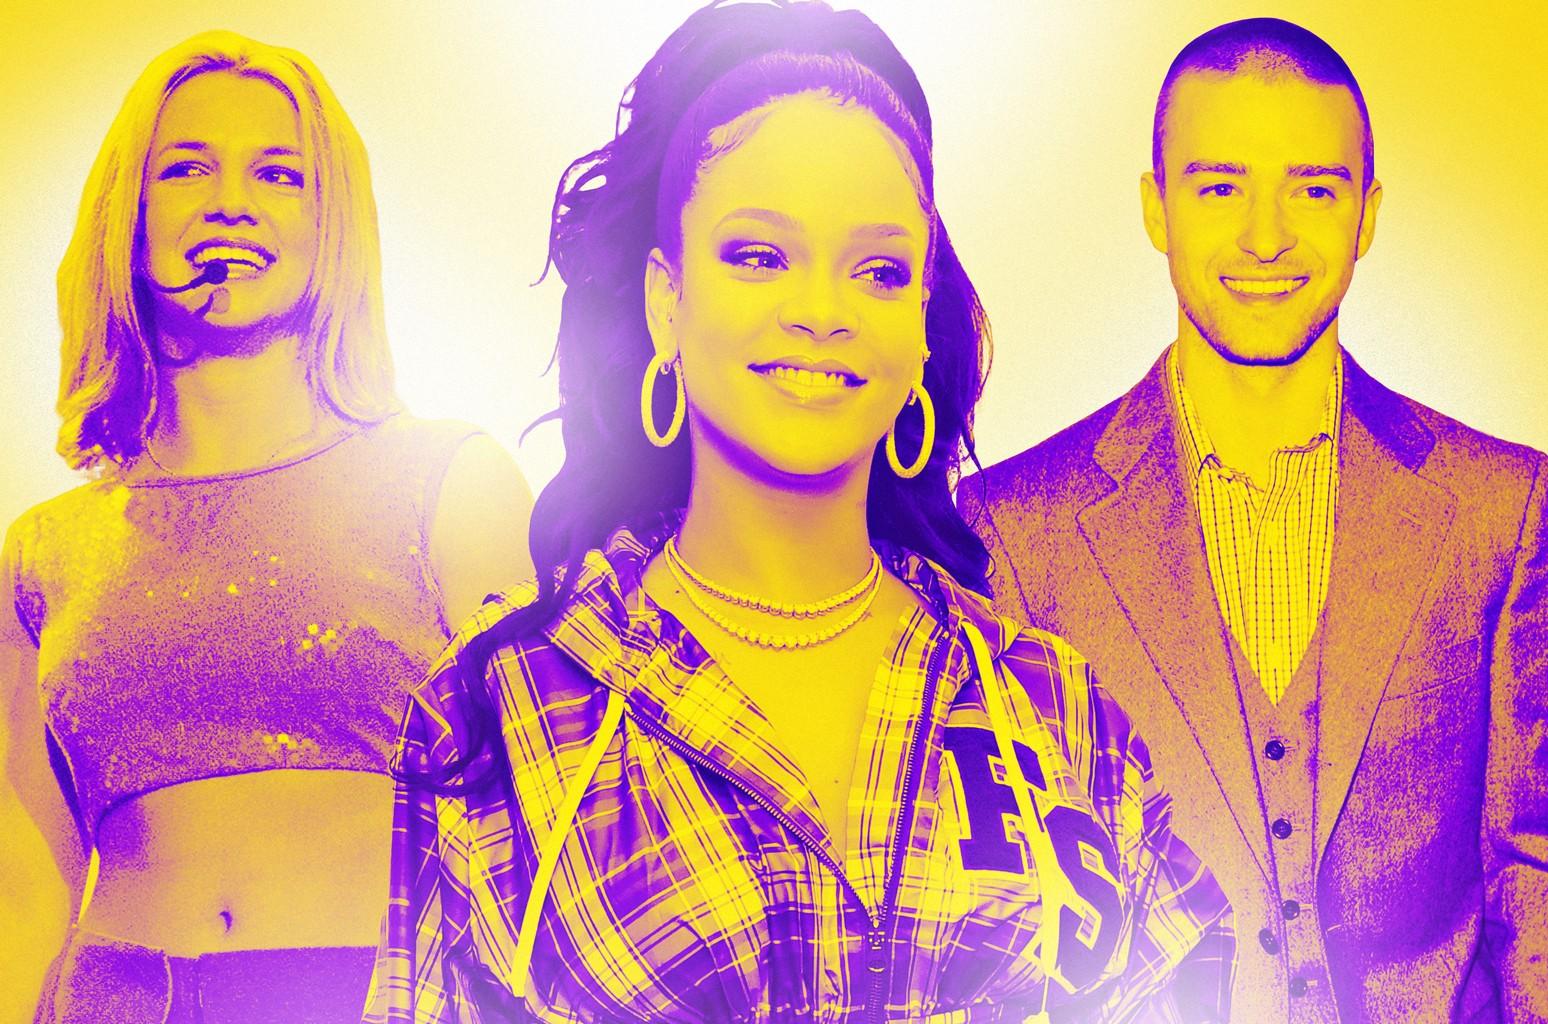 Britney Spears, Rihanna & Justin Timberlake